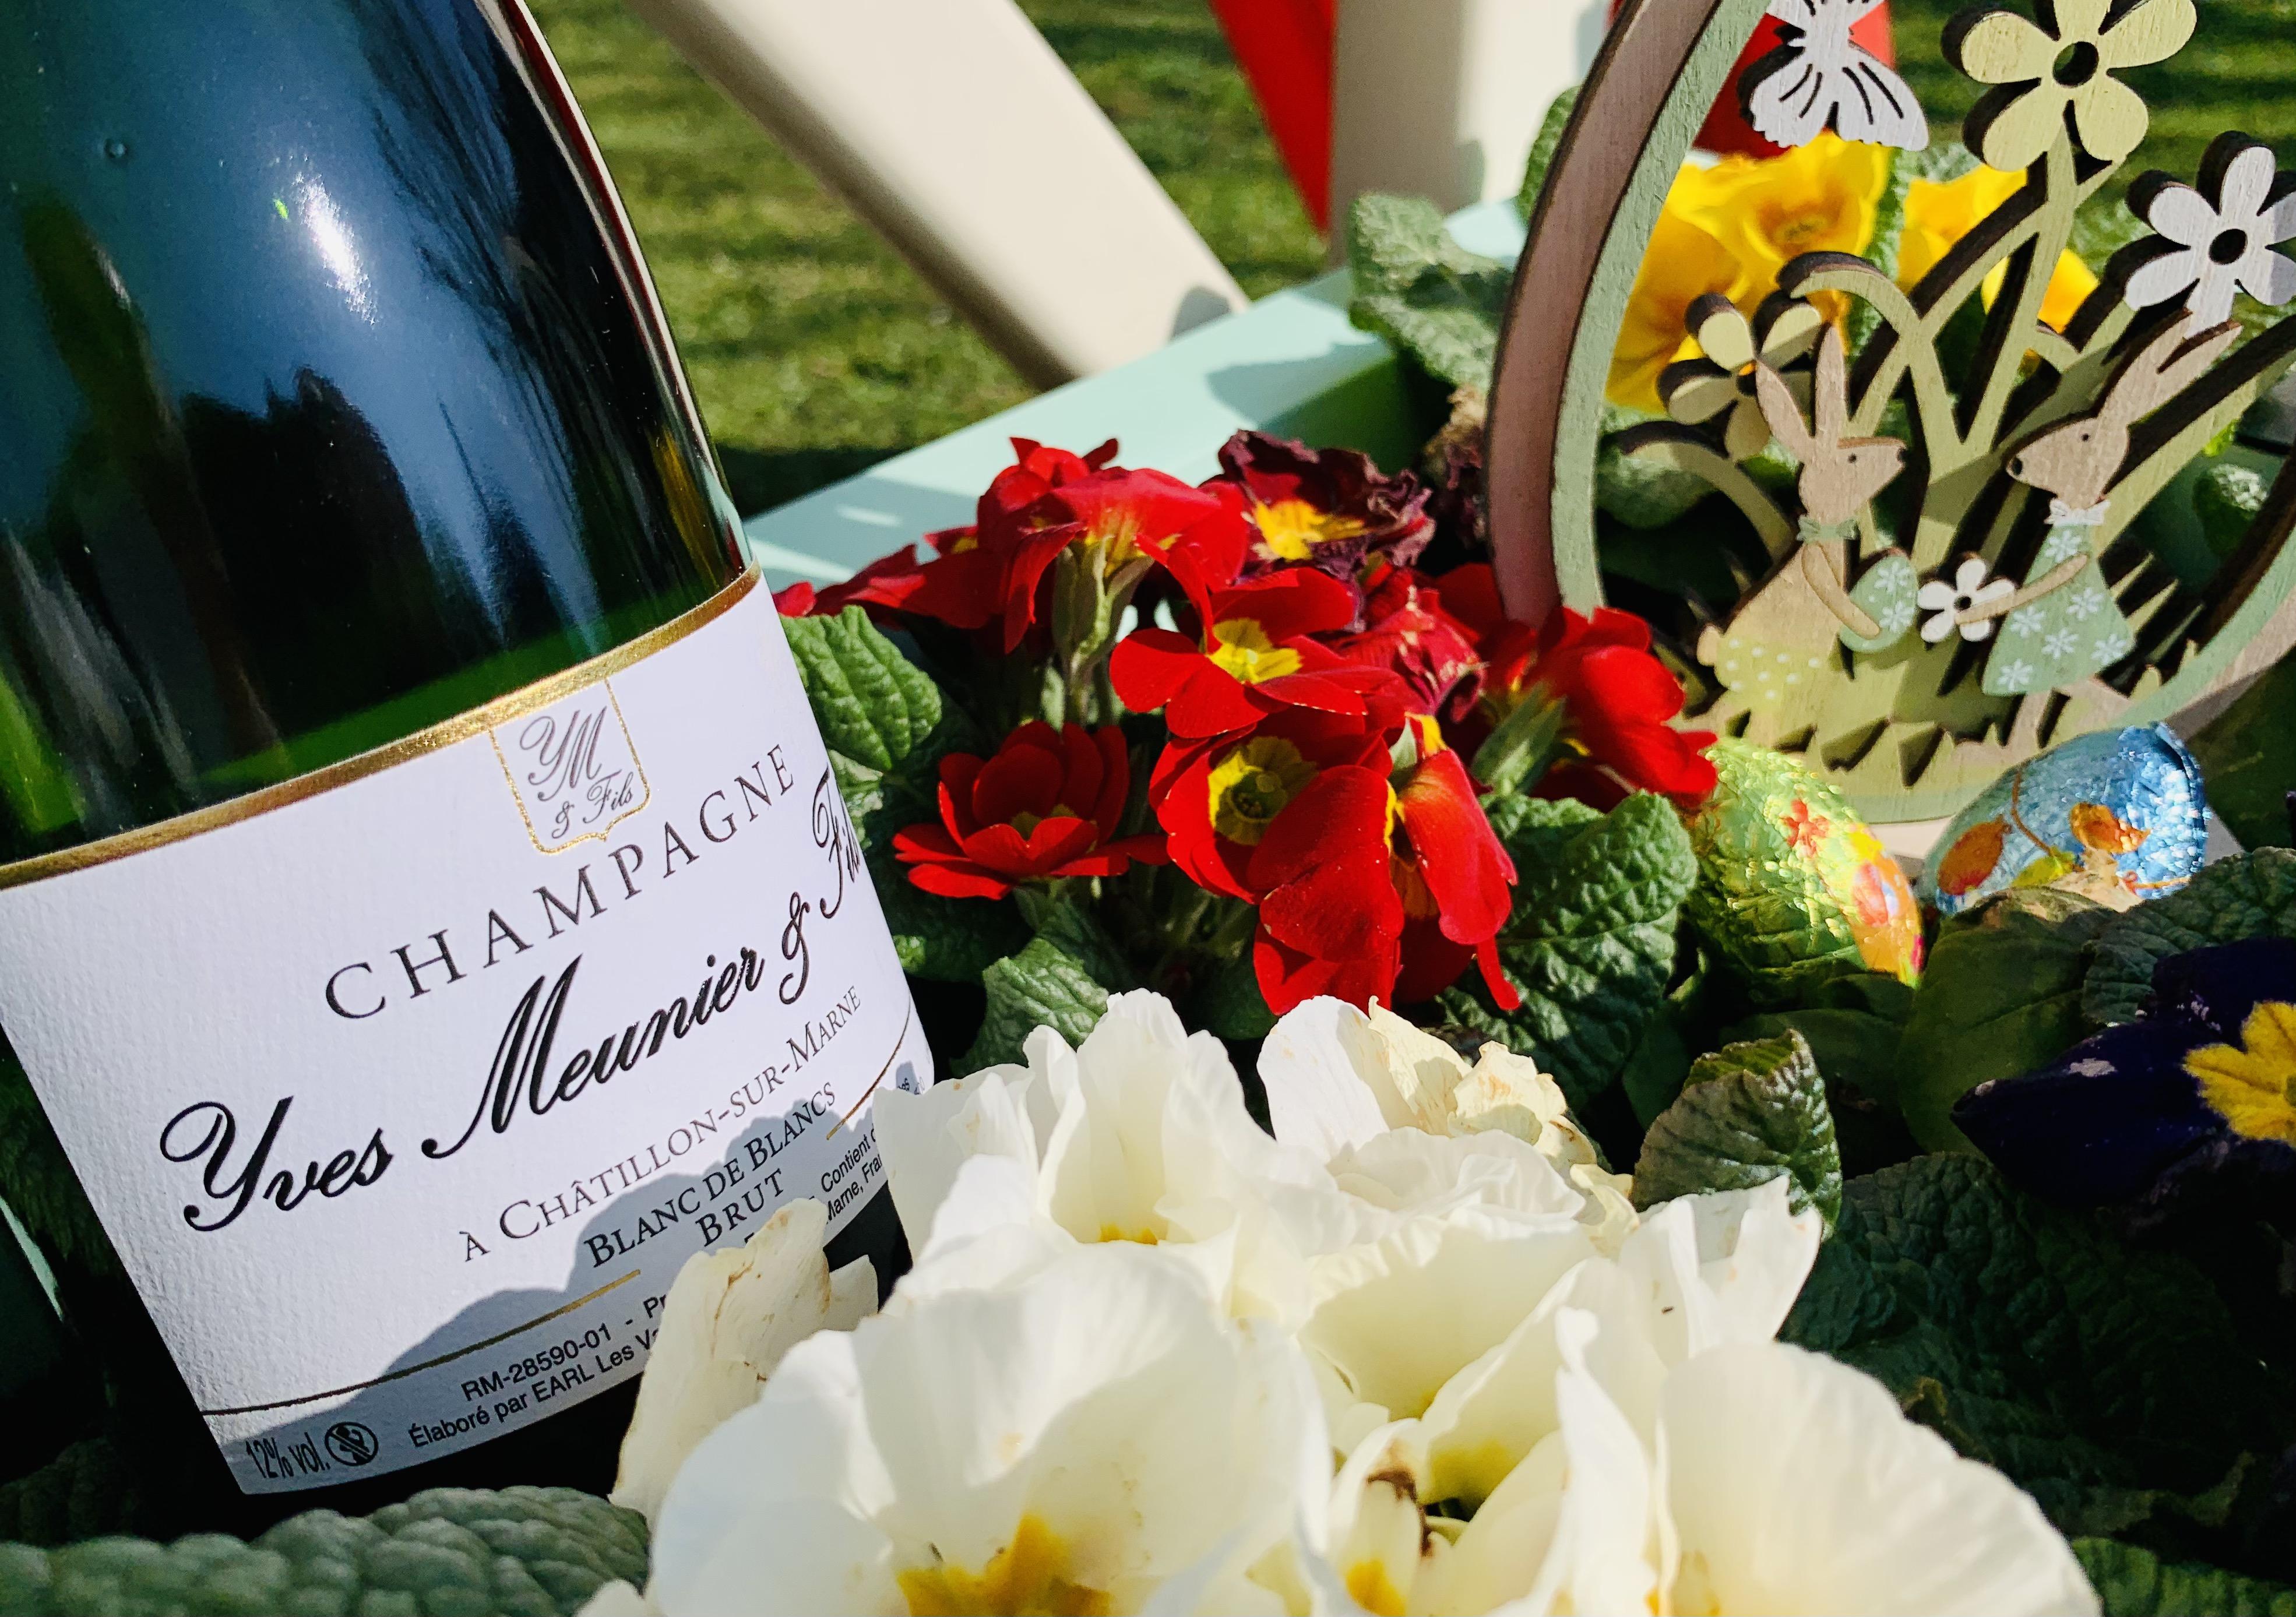 ChampagneYvesMeunier&Fils-blanc de blancs